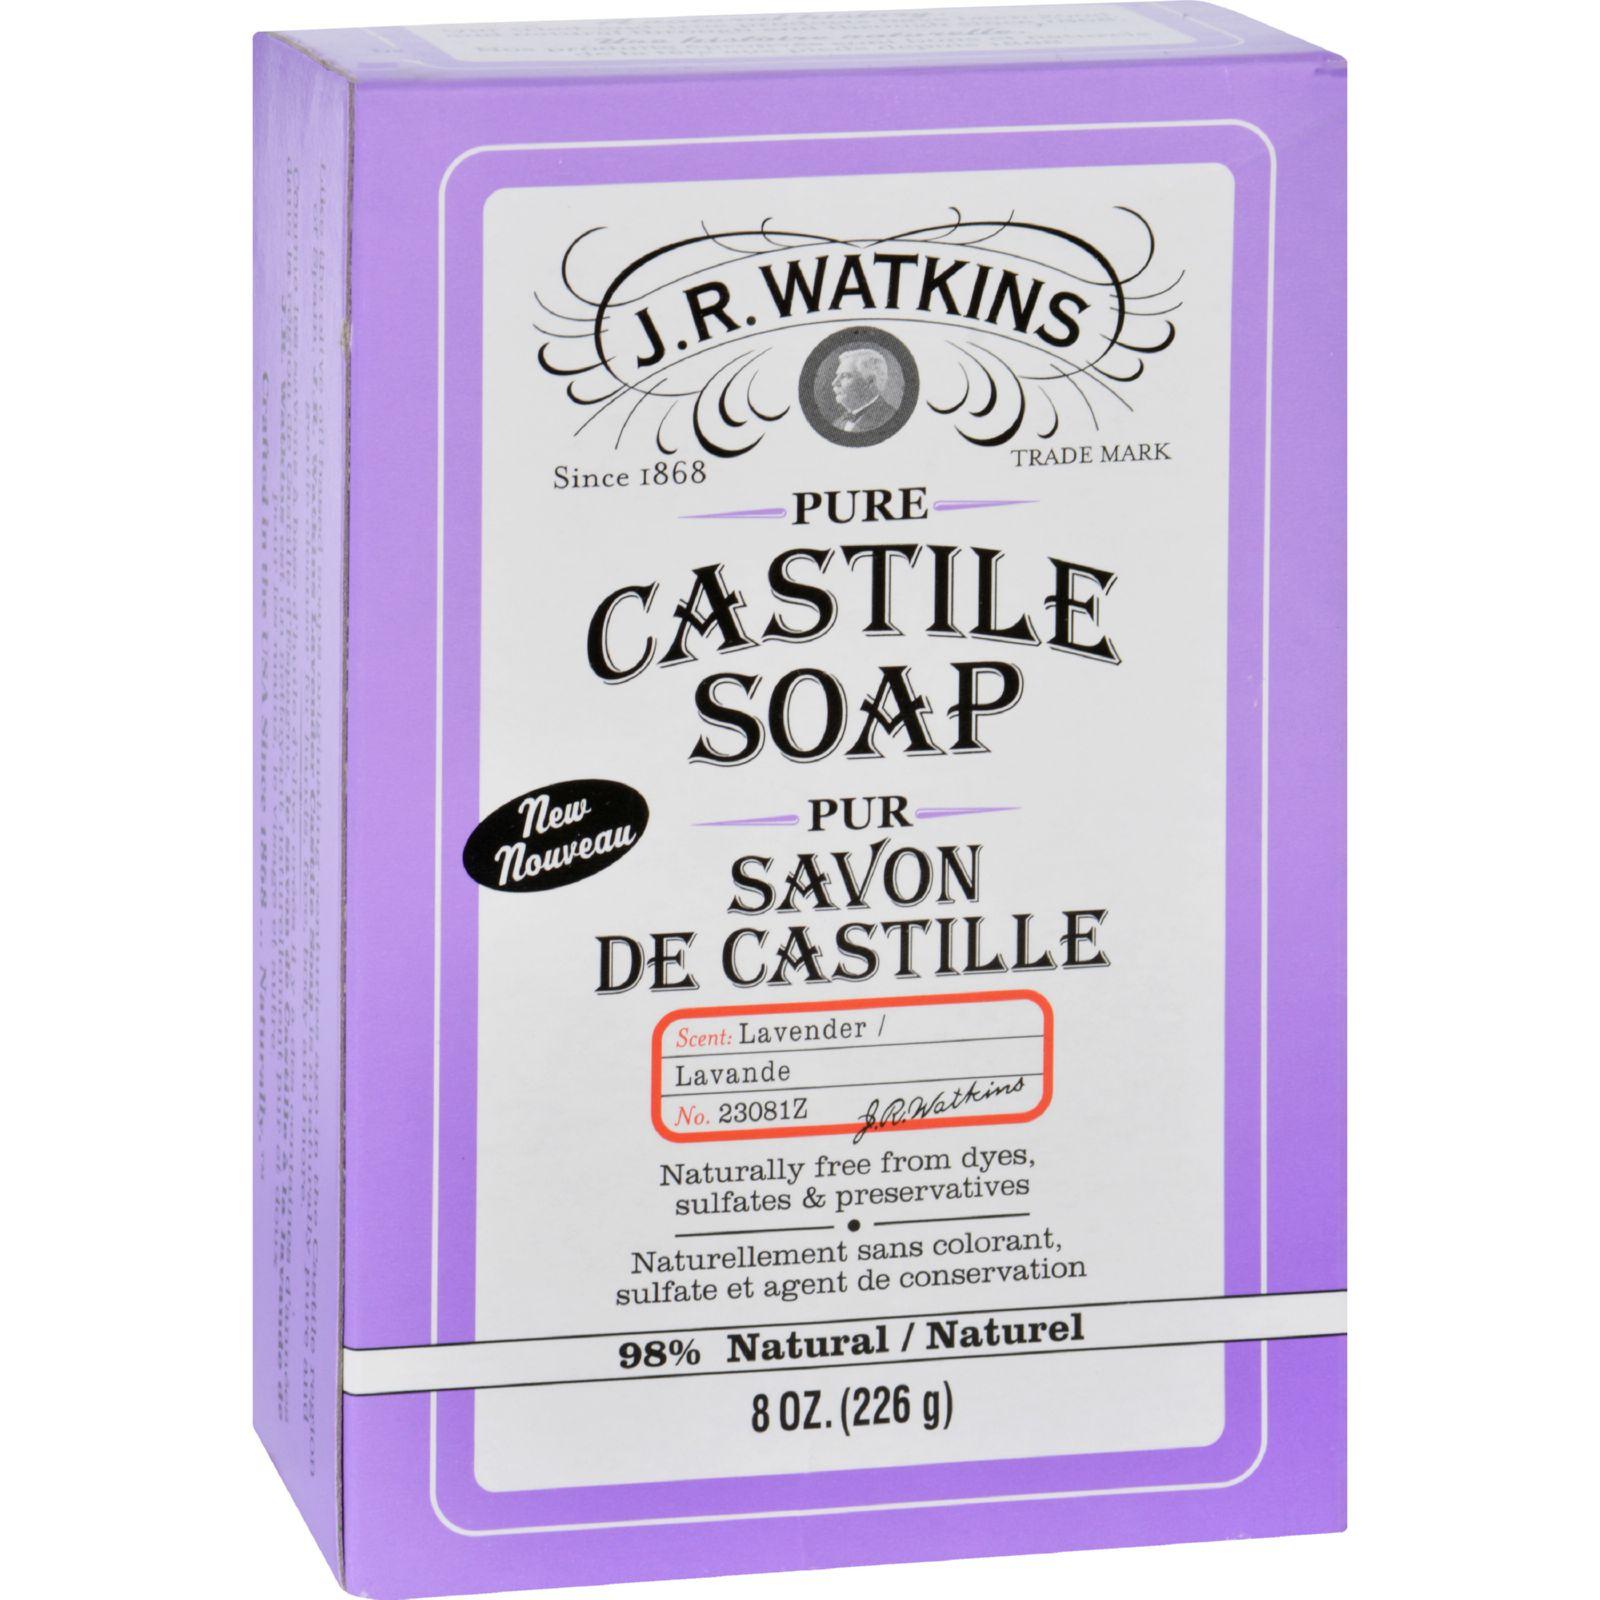 J.R. Watkins Bar Soap  Castile  Lavender  8 oz